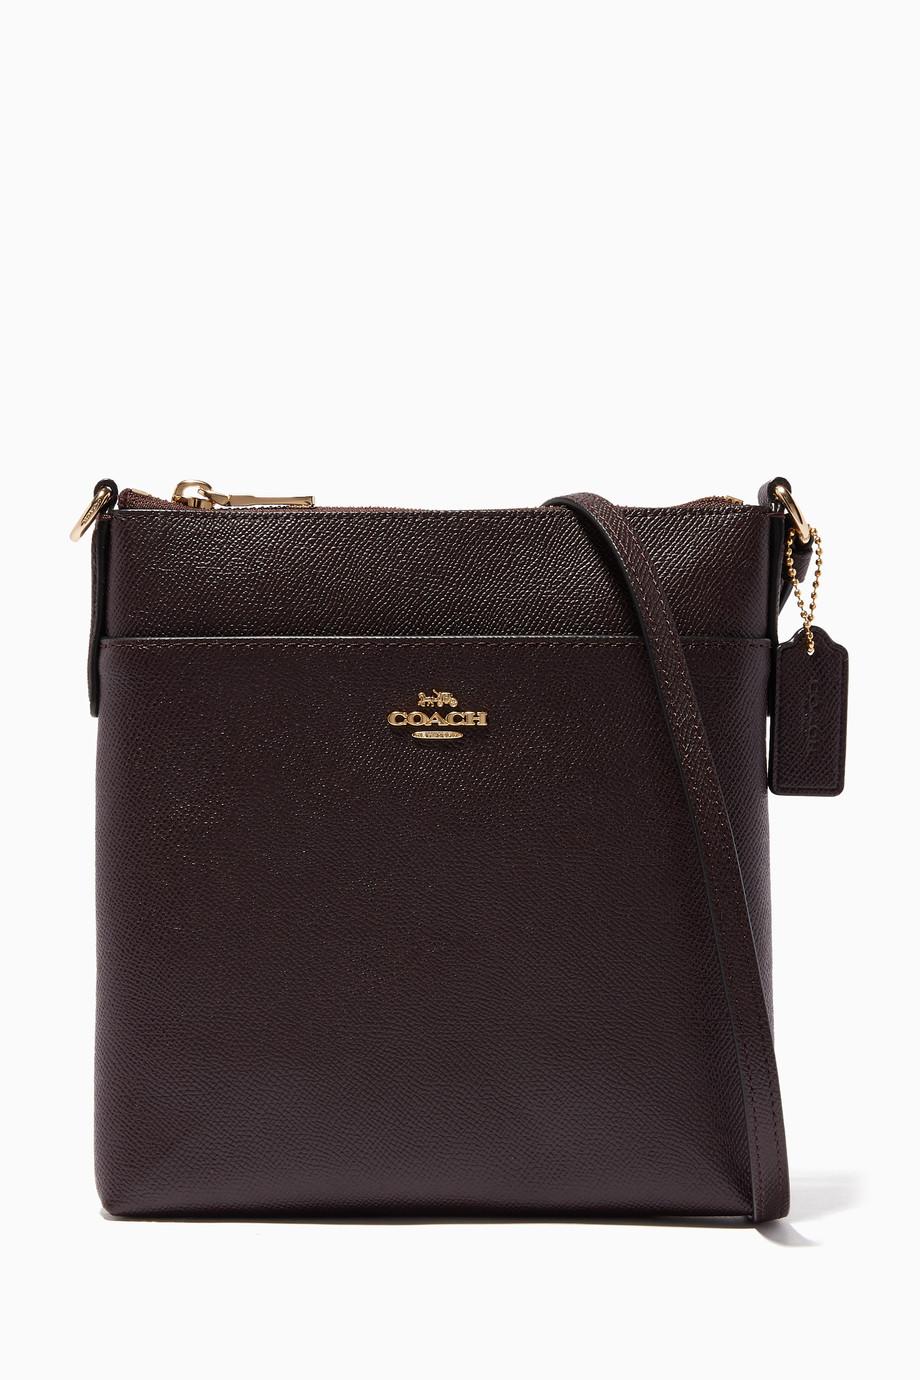 5ad3b79040c9 Shop Coach Burgundy Dark-Red Messenger Cross-Body Bag for Women ...